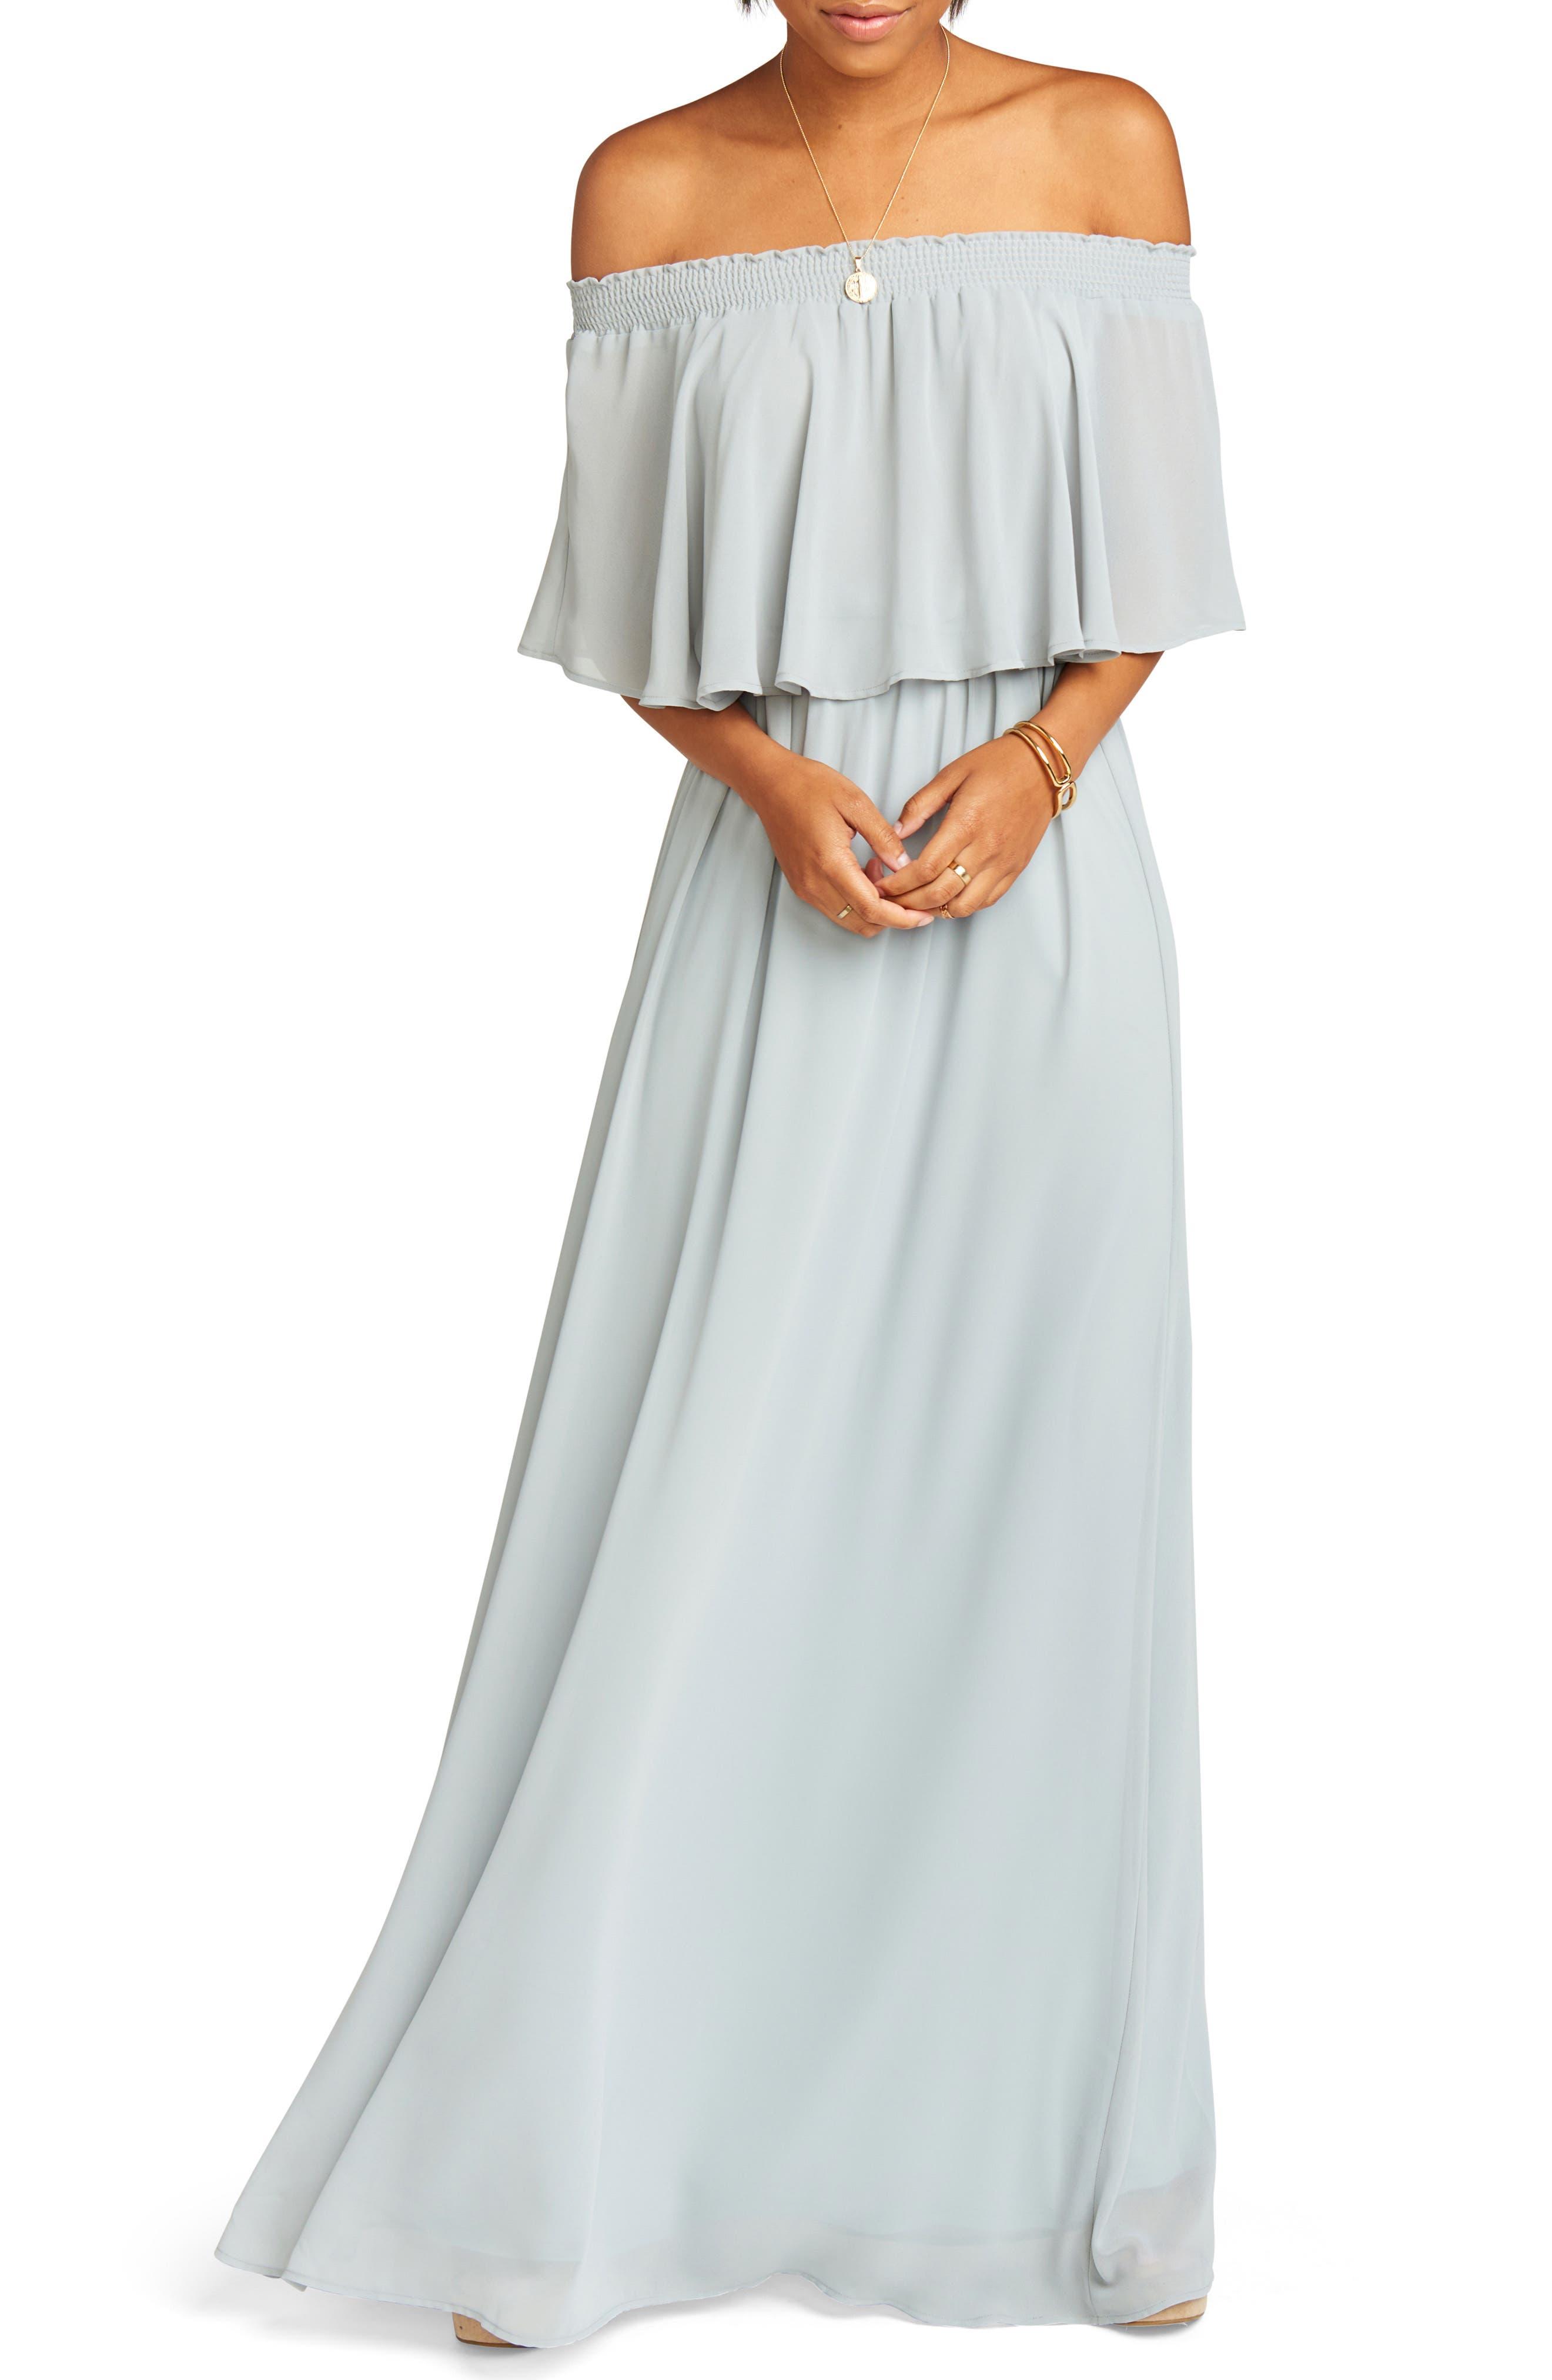 Hacienda Convertible Gown,                         Main,                         color, 050